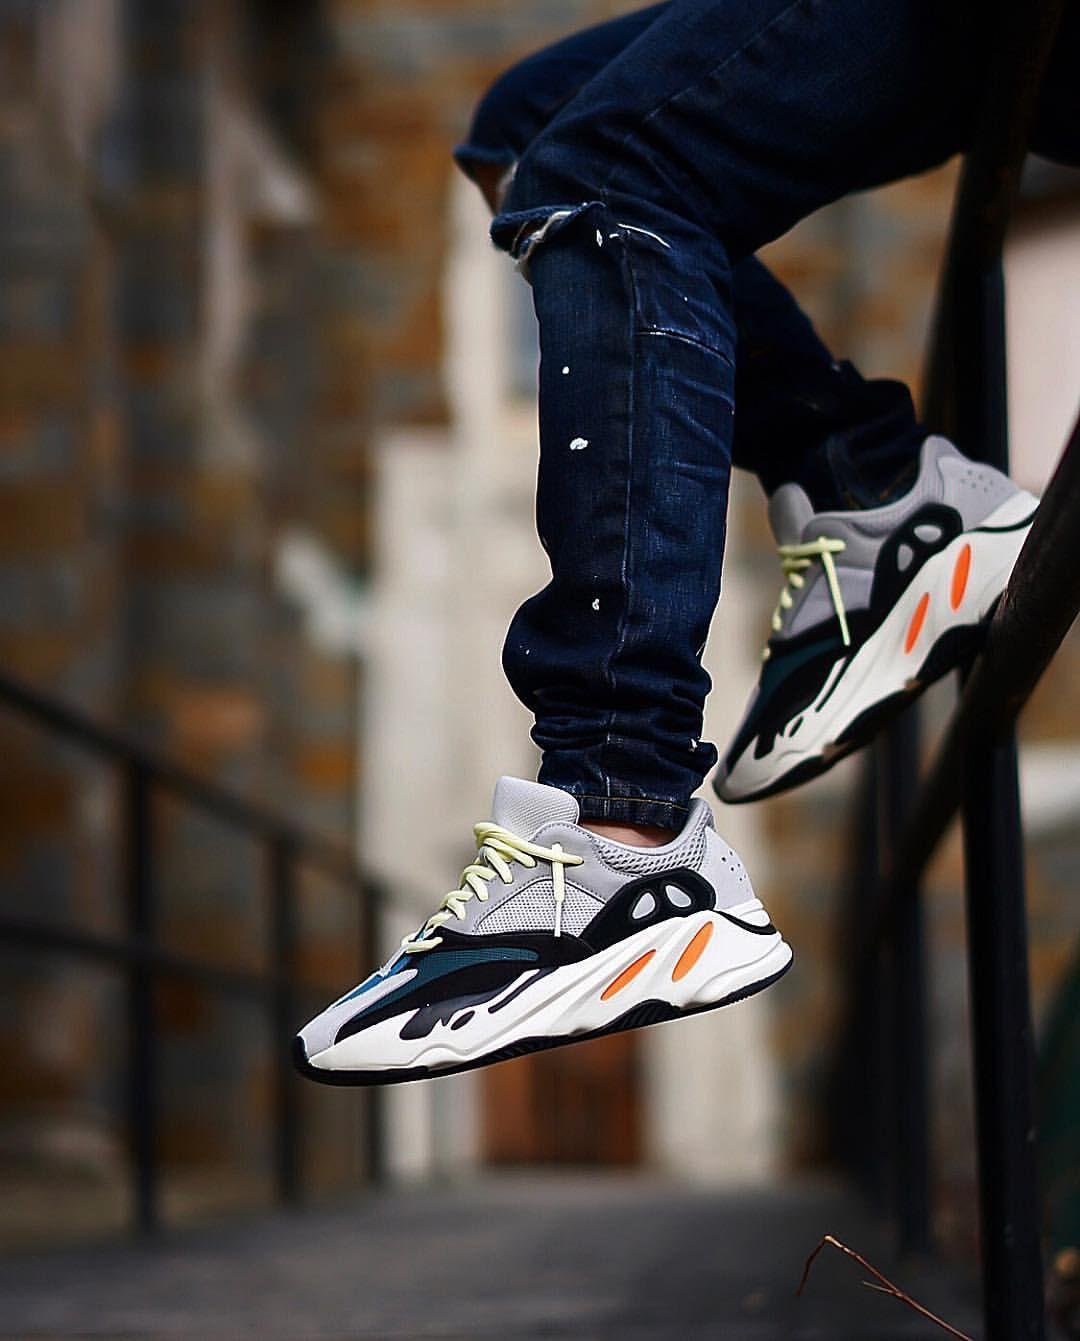 ADIDAS YEEZY BOOST 700 Wave Runner White Black Sneakers